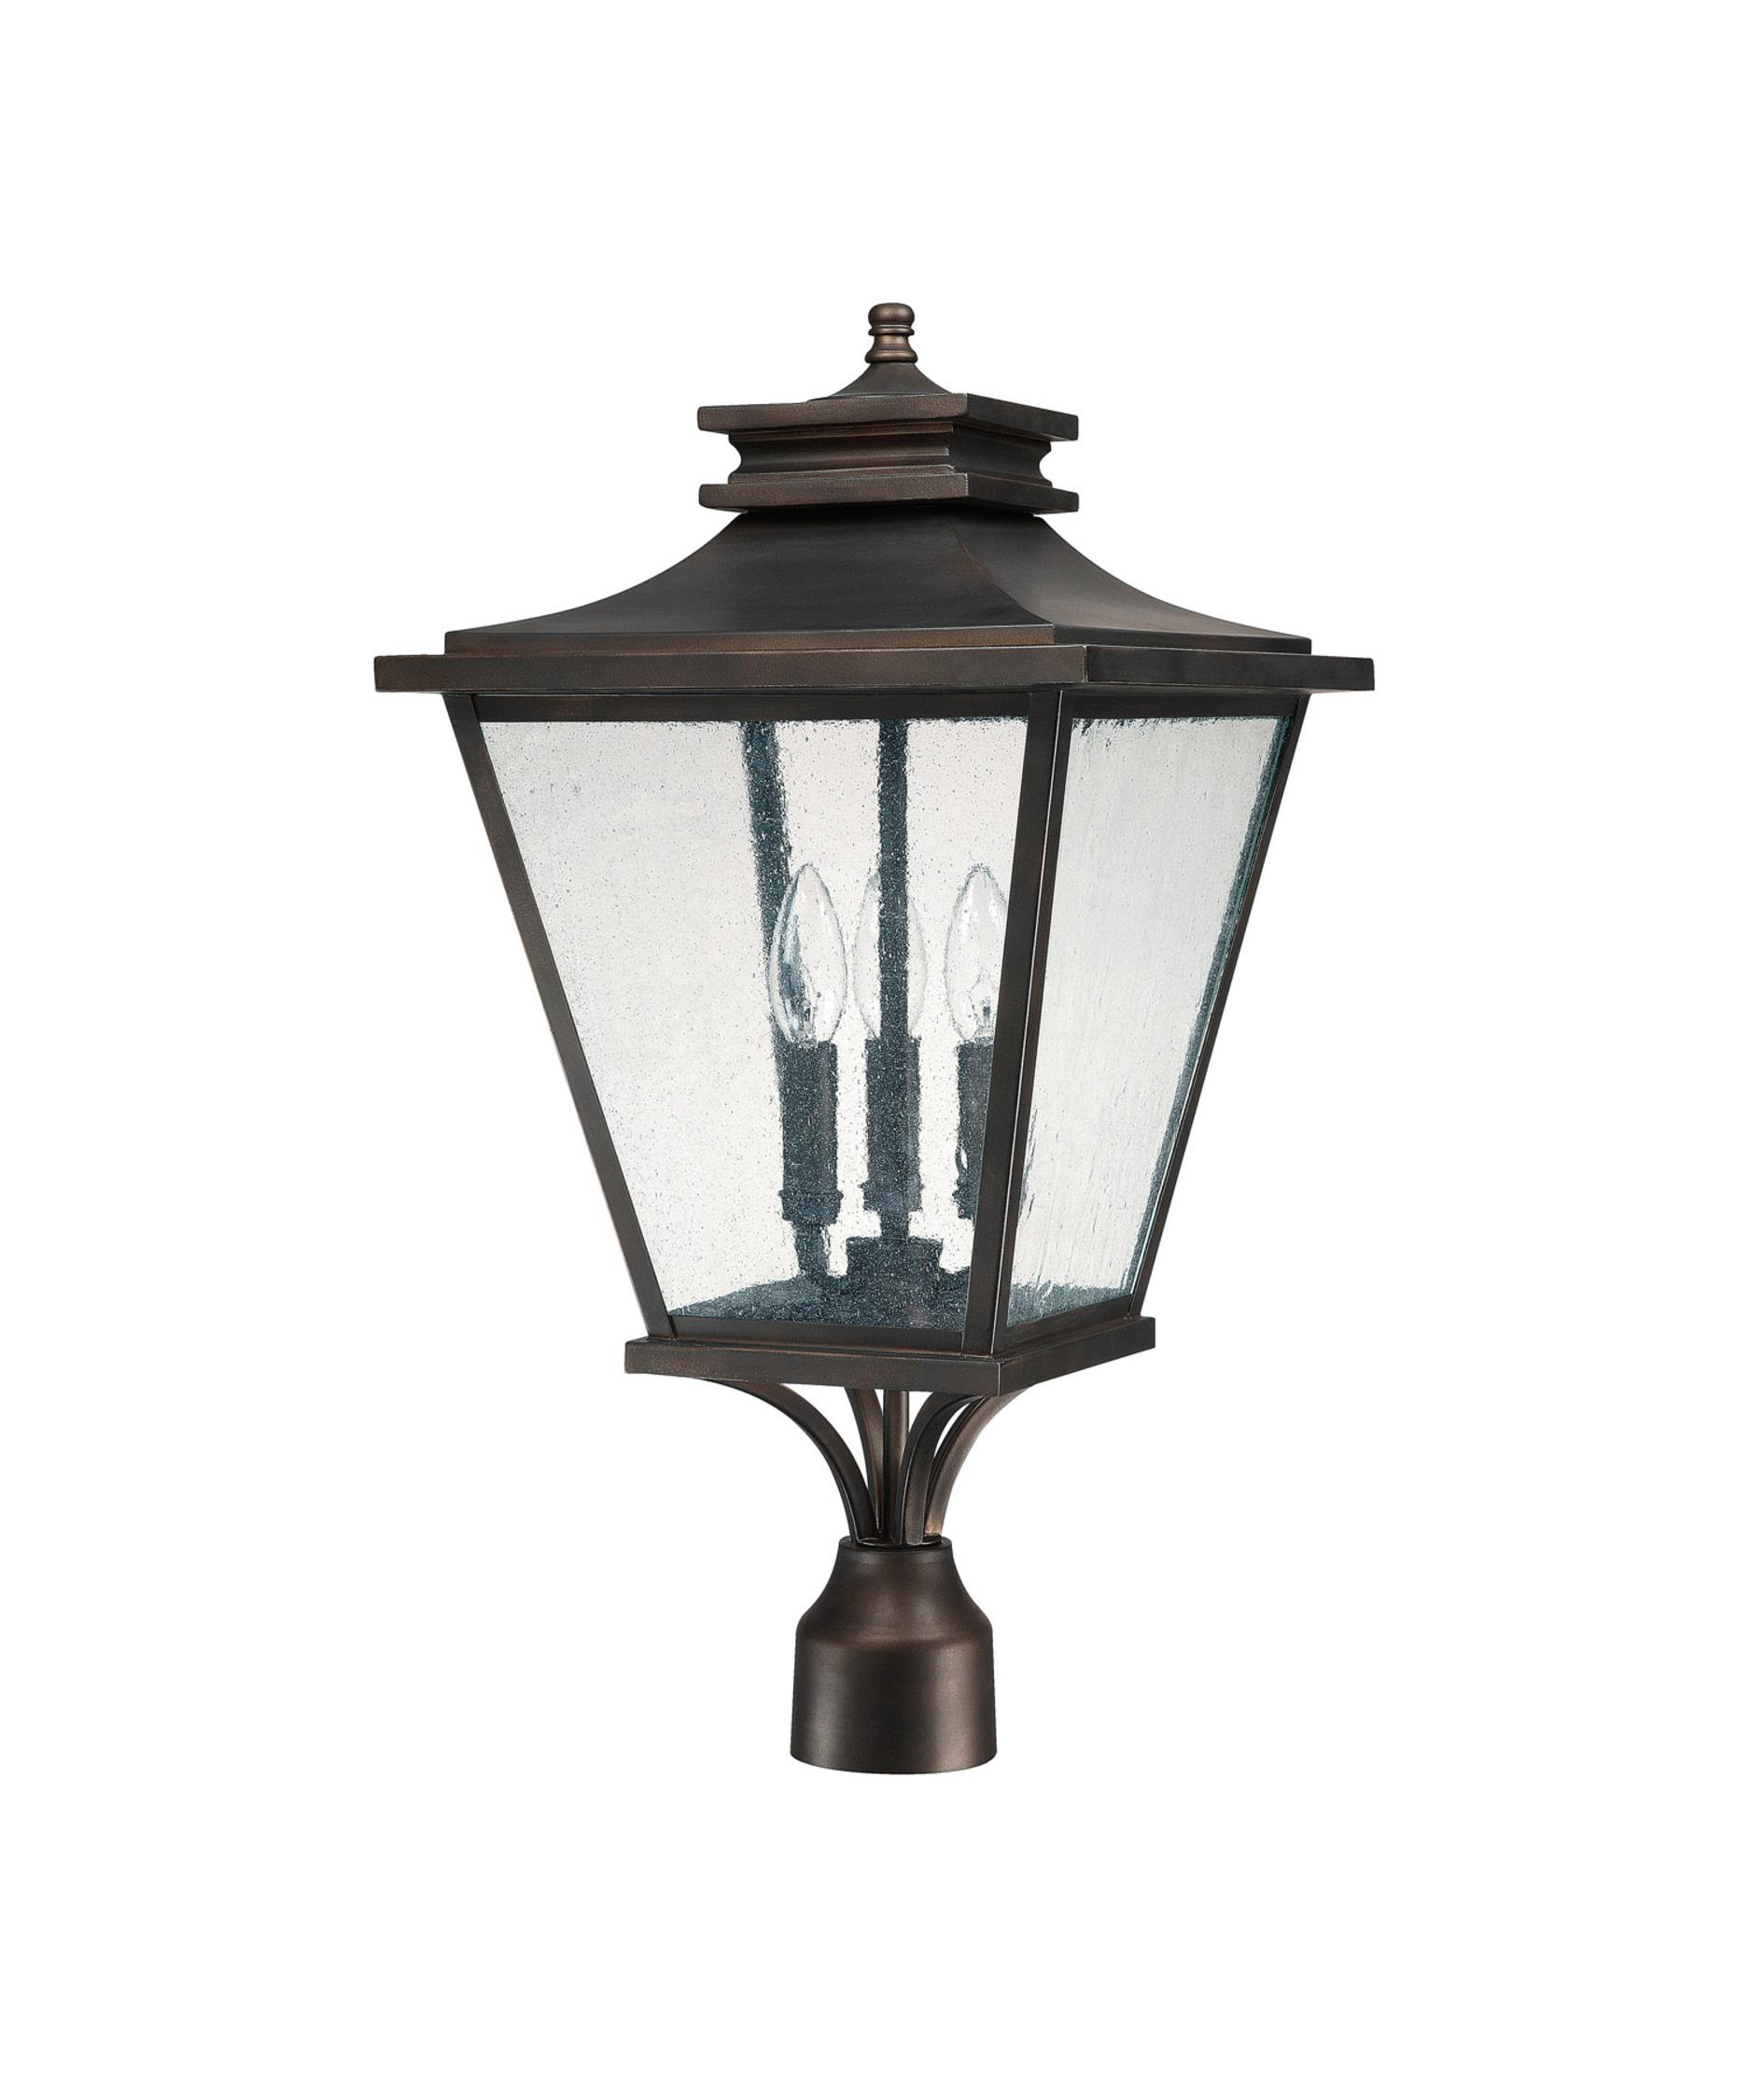 Capital Lighting 9466 Gentry 12 Inch Wide 3 Light Outdoor Post Lamp    Capitol Lighting 1 800lighting.com